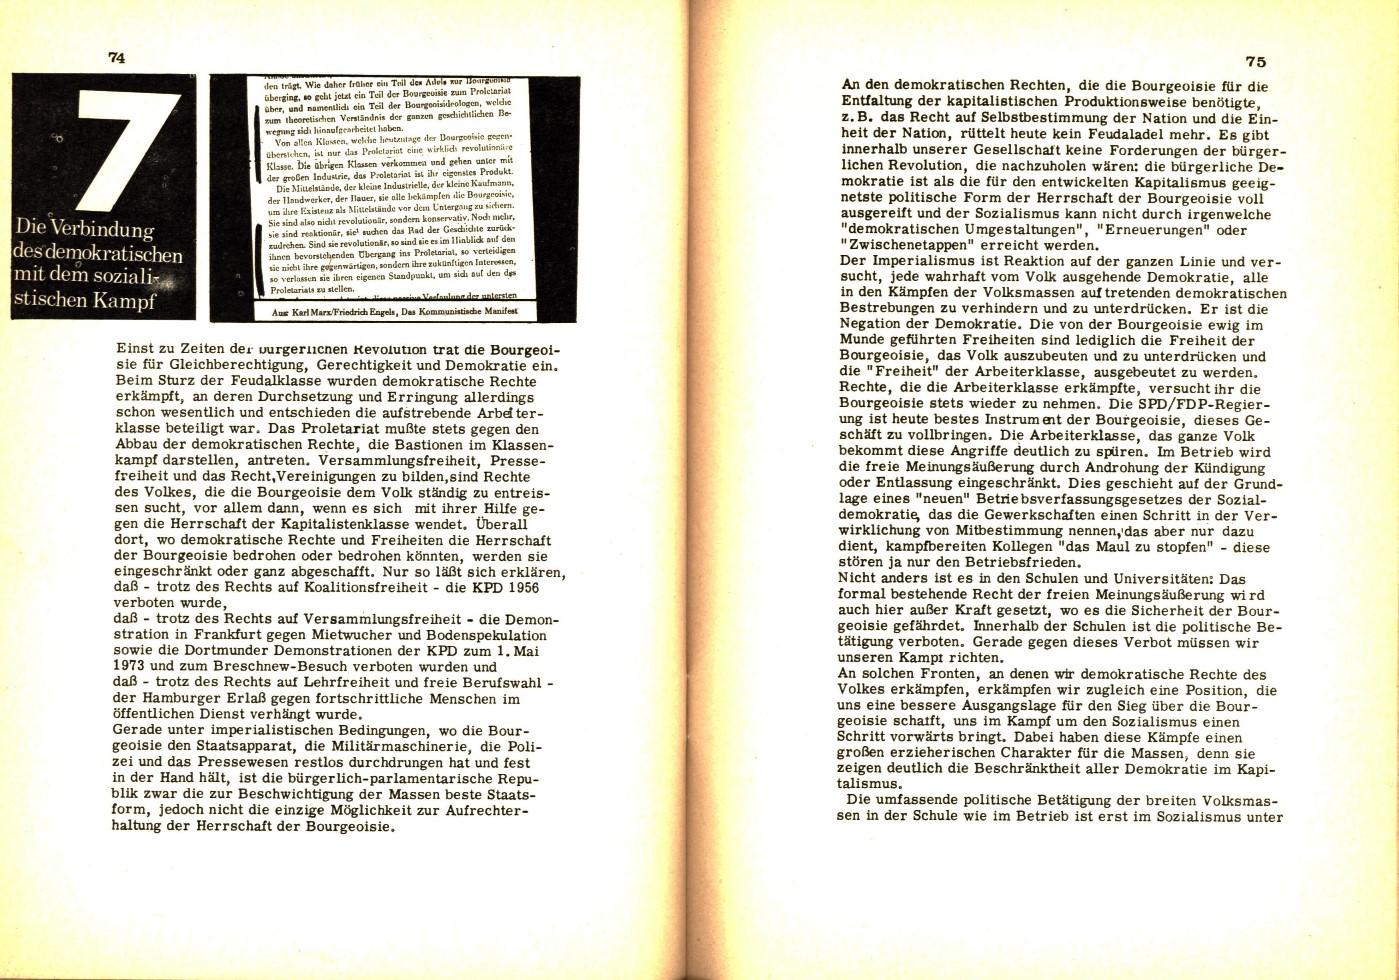 KOV_1973_Aktionsprogramm_40